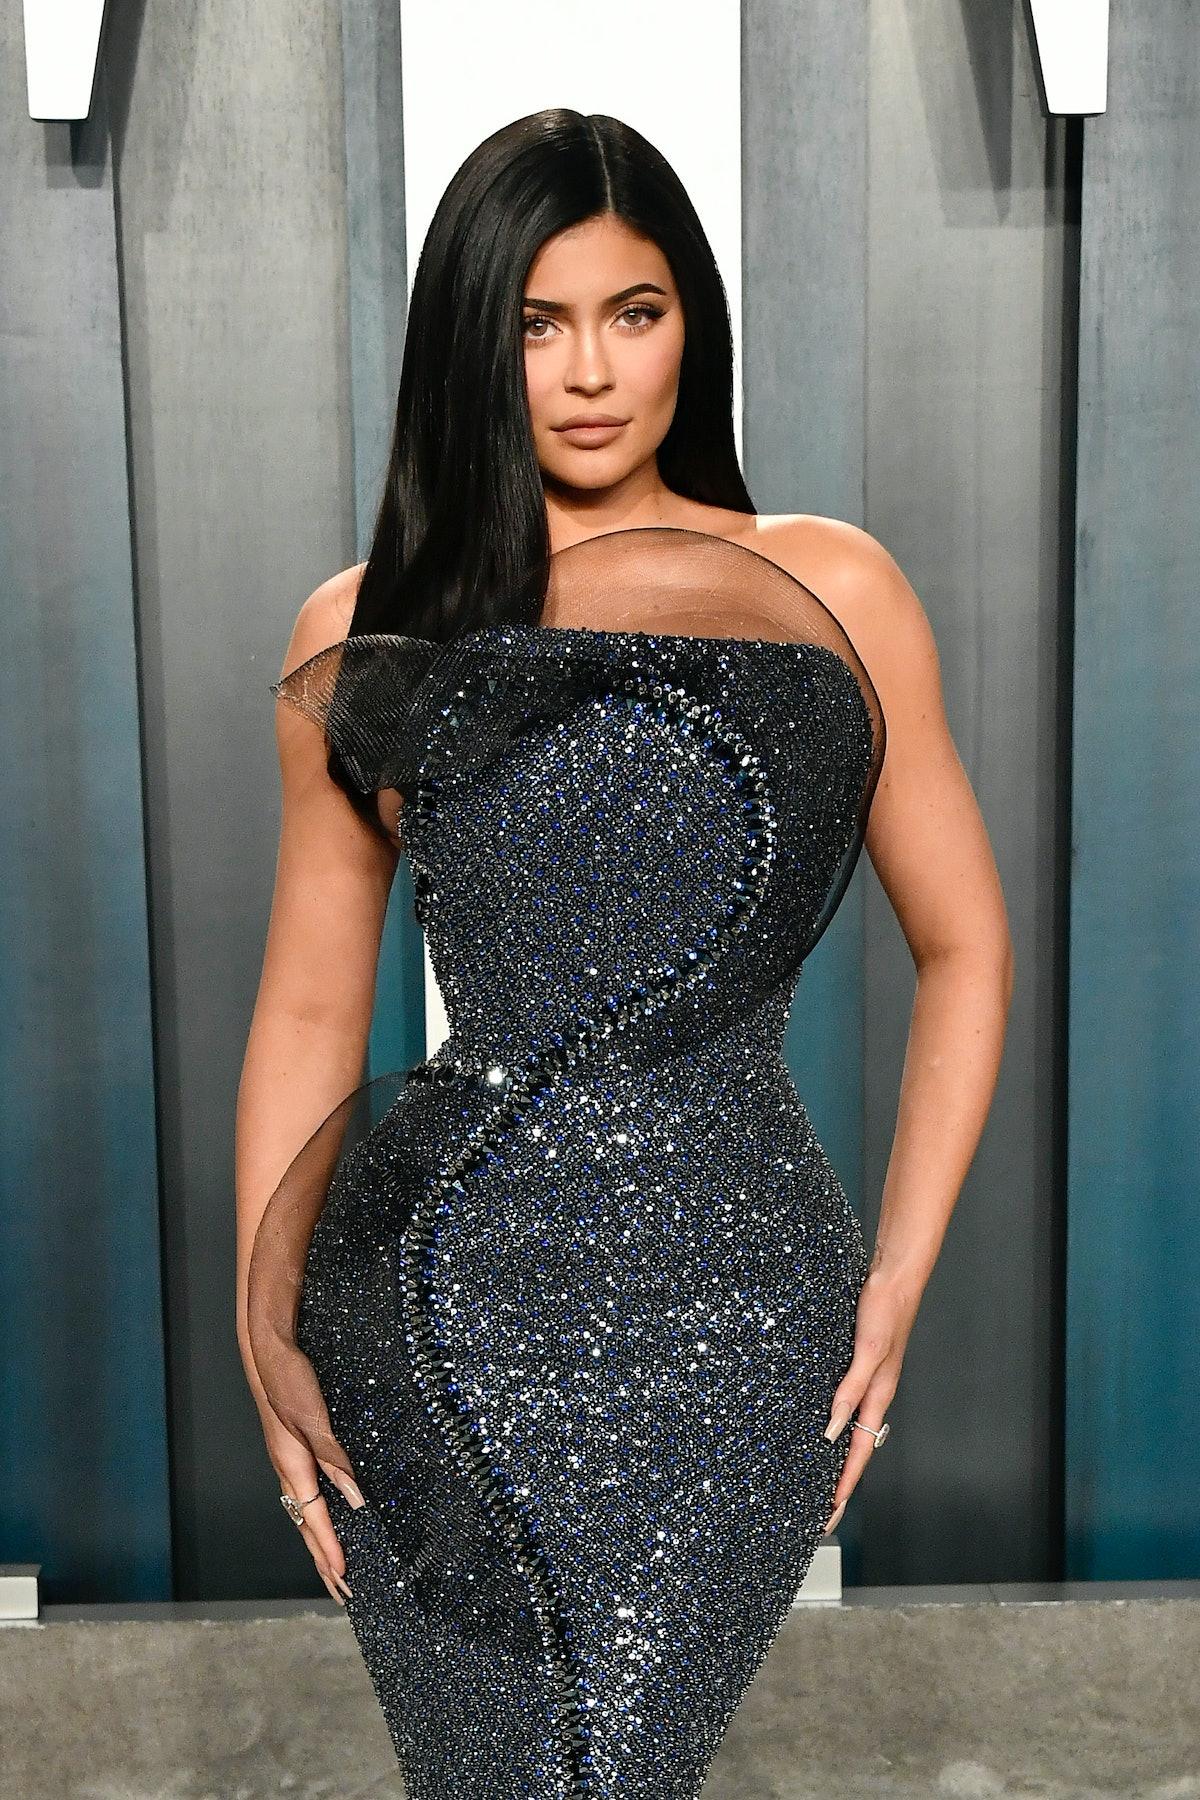 BEVERLY HILLS, CALIFORNIA - FEBRUARY 09: Kylie Jenner attends the 2020 Vanity Fair Oscar Party hoste...